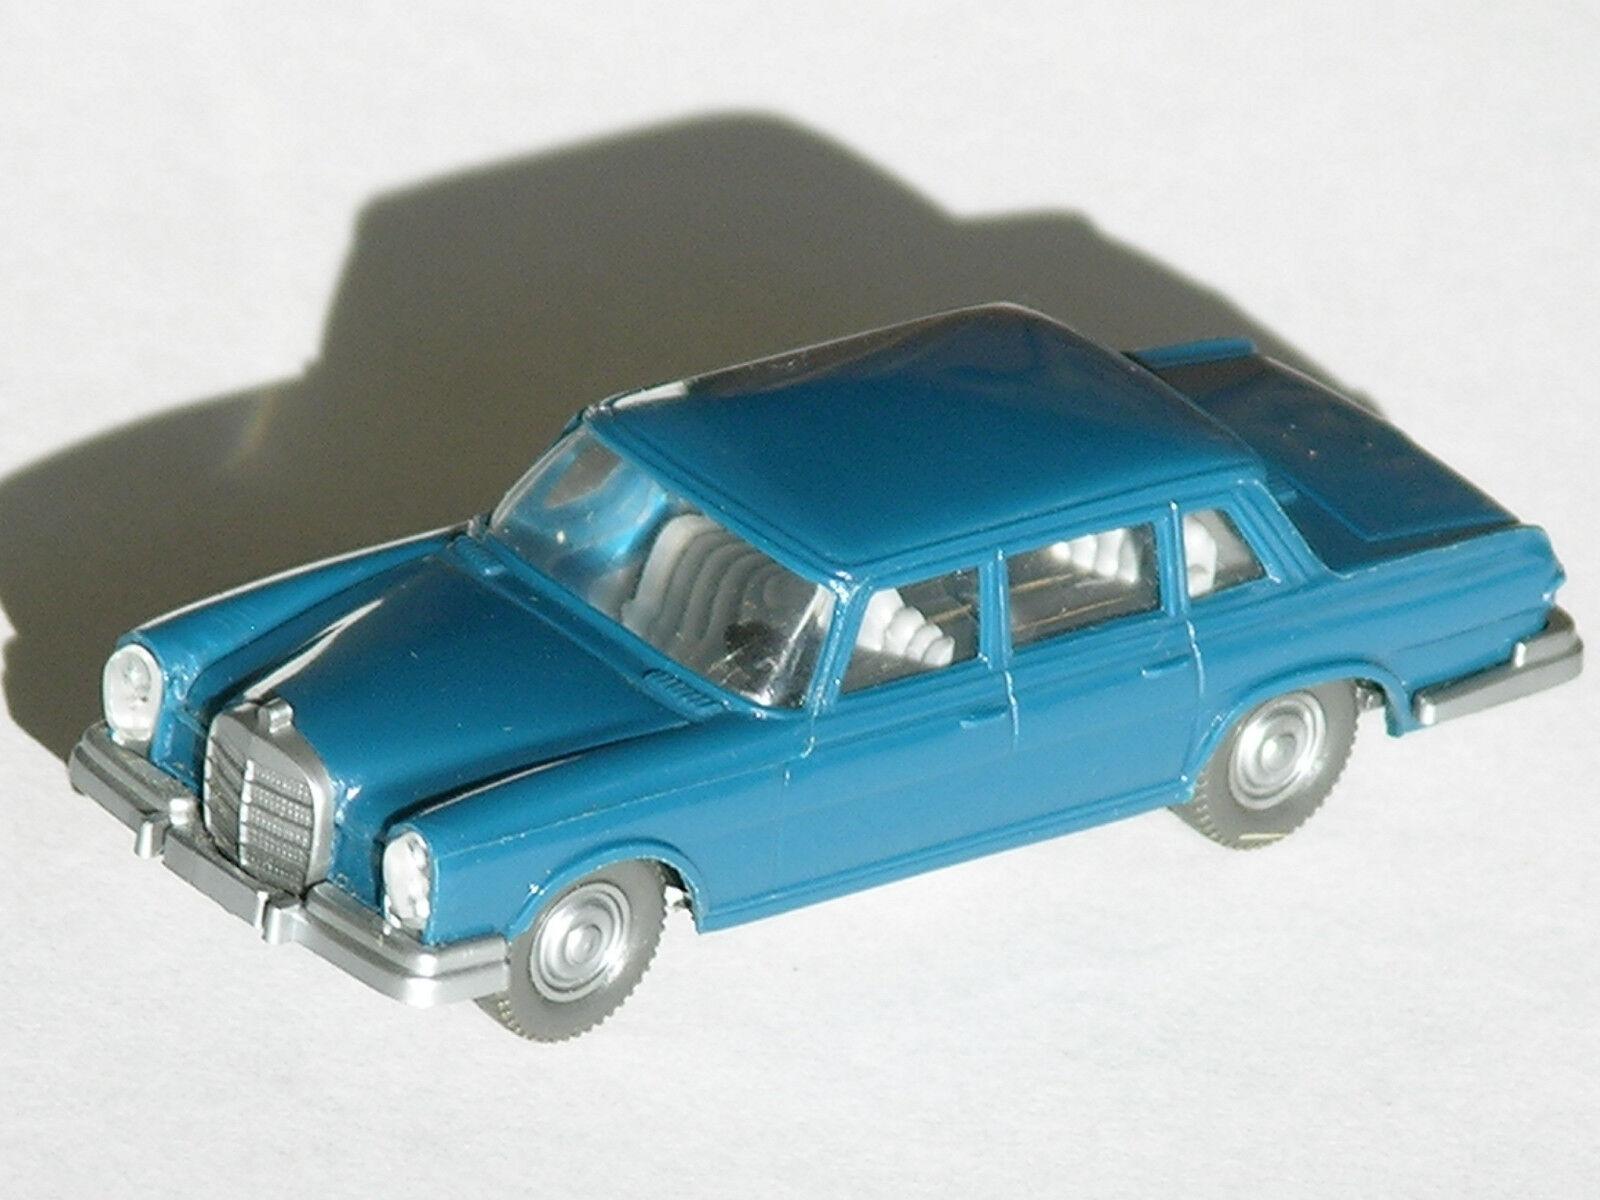 Mercedes Benz MB MB MB 600 ozeanblau GK 156 1c CS 380 1a Wiking 1 87  | Online einkaufen  543ac5